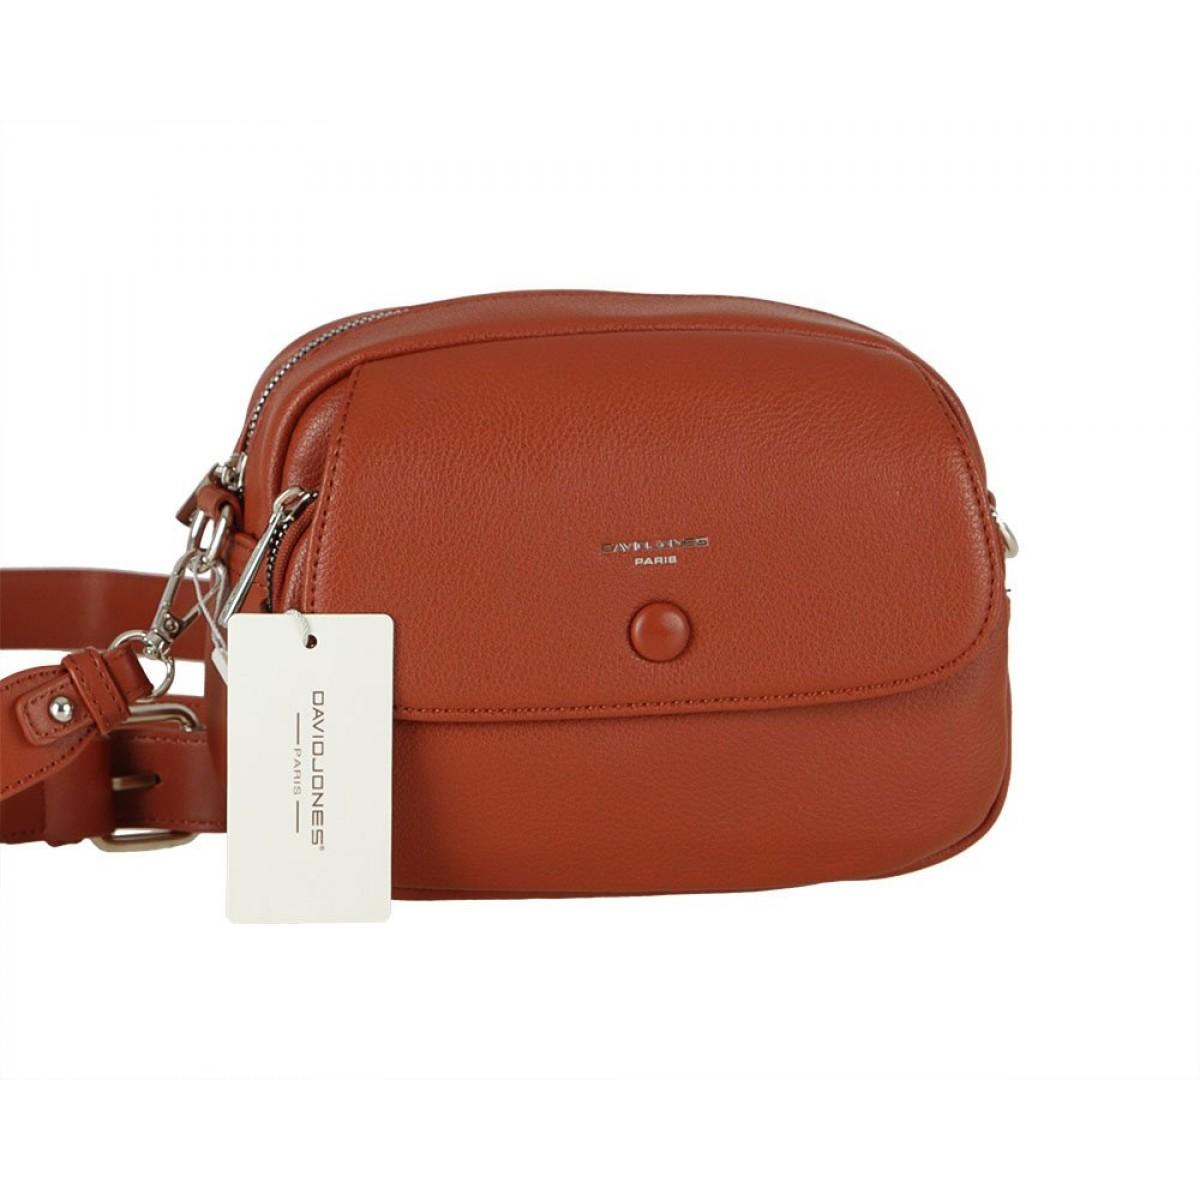 Жіноча сумка David Jones 6428-1 SIENNA